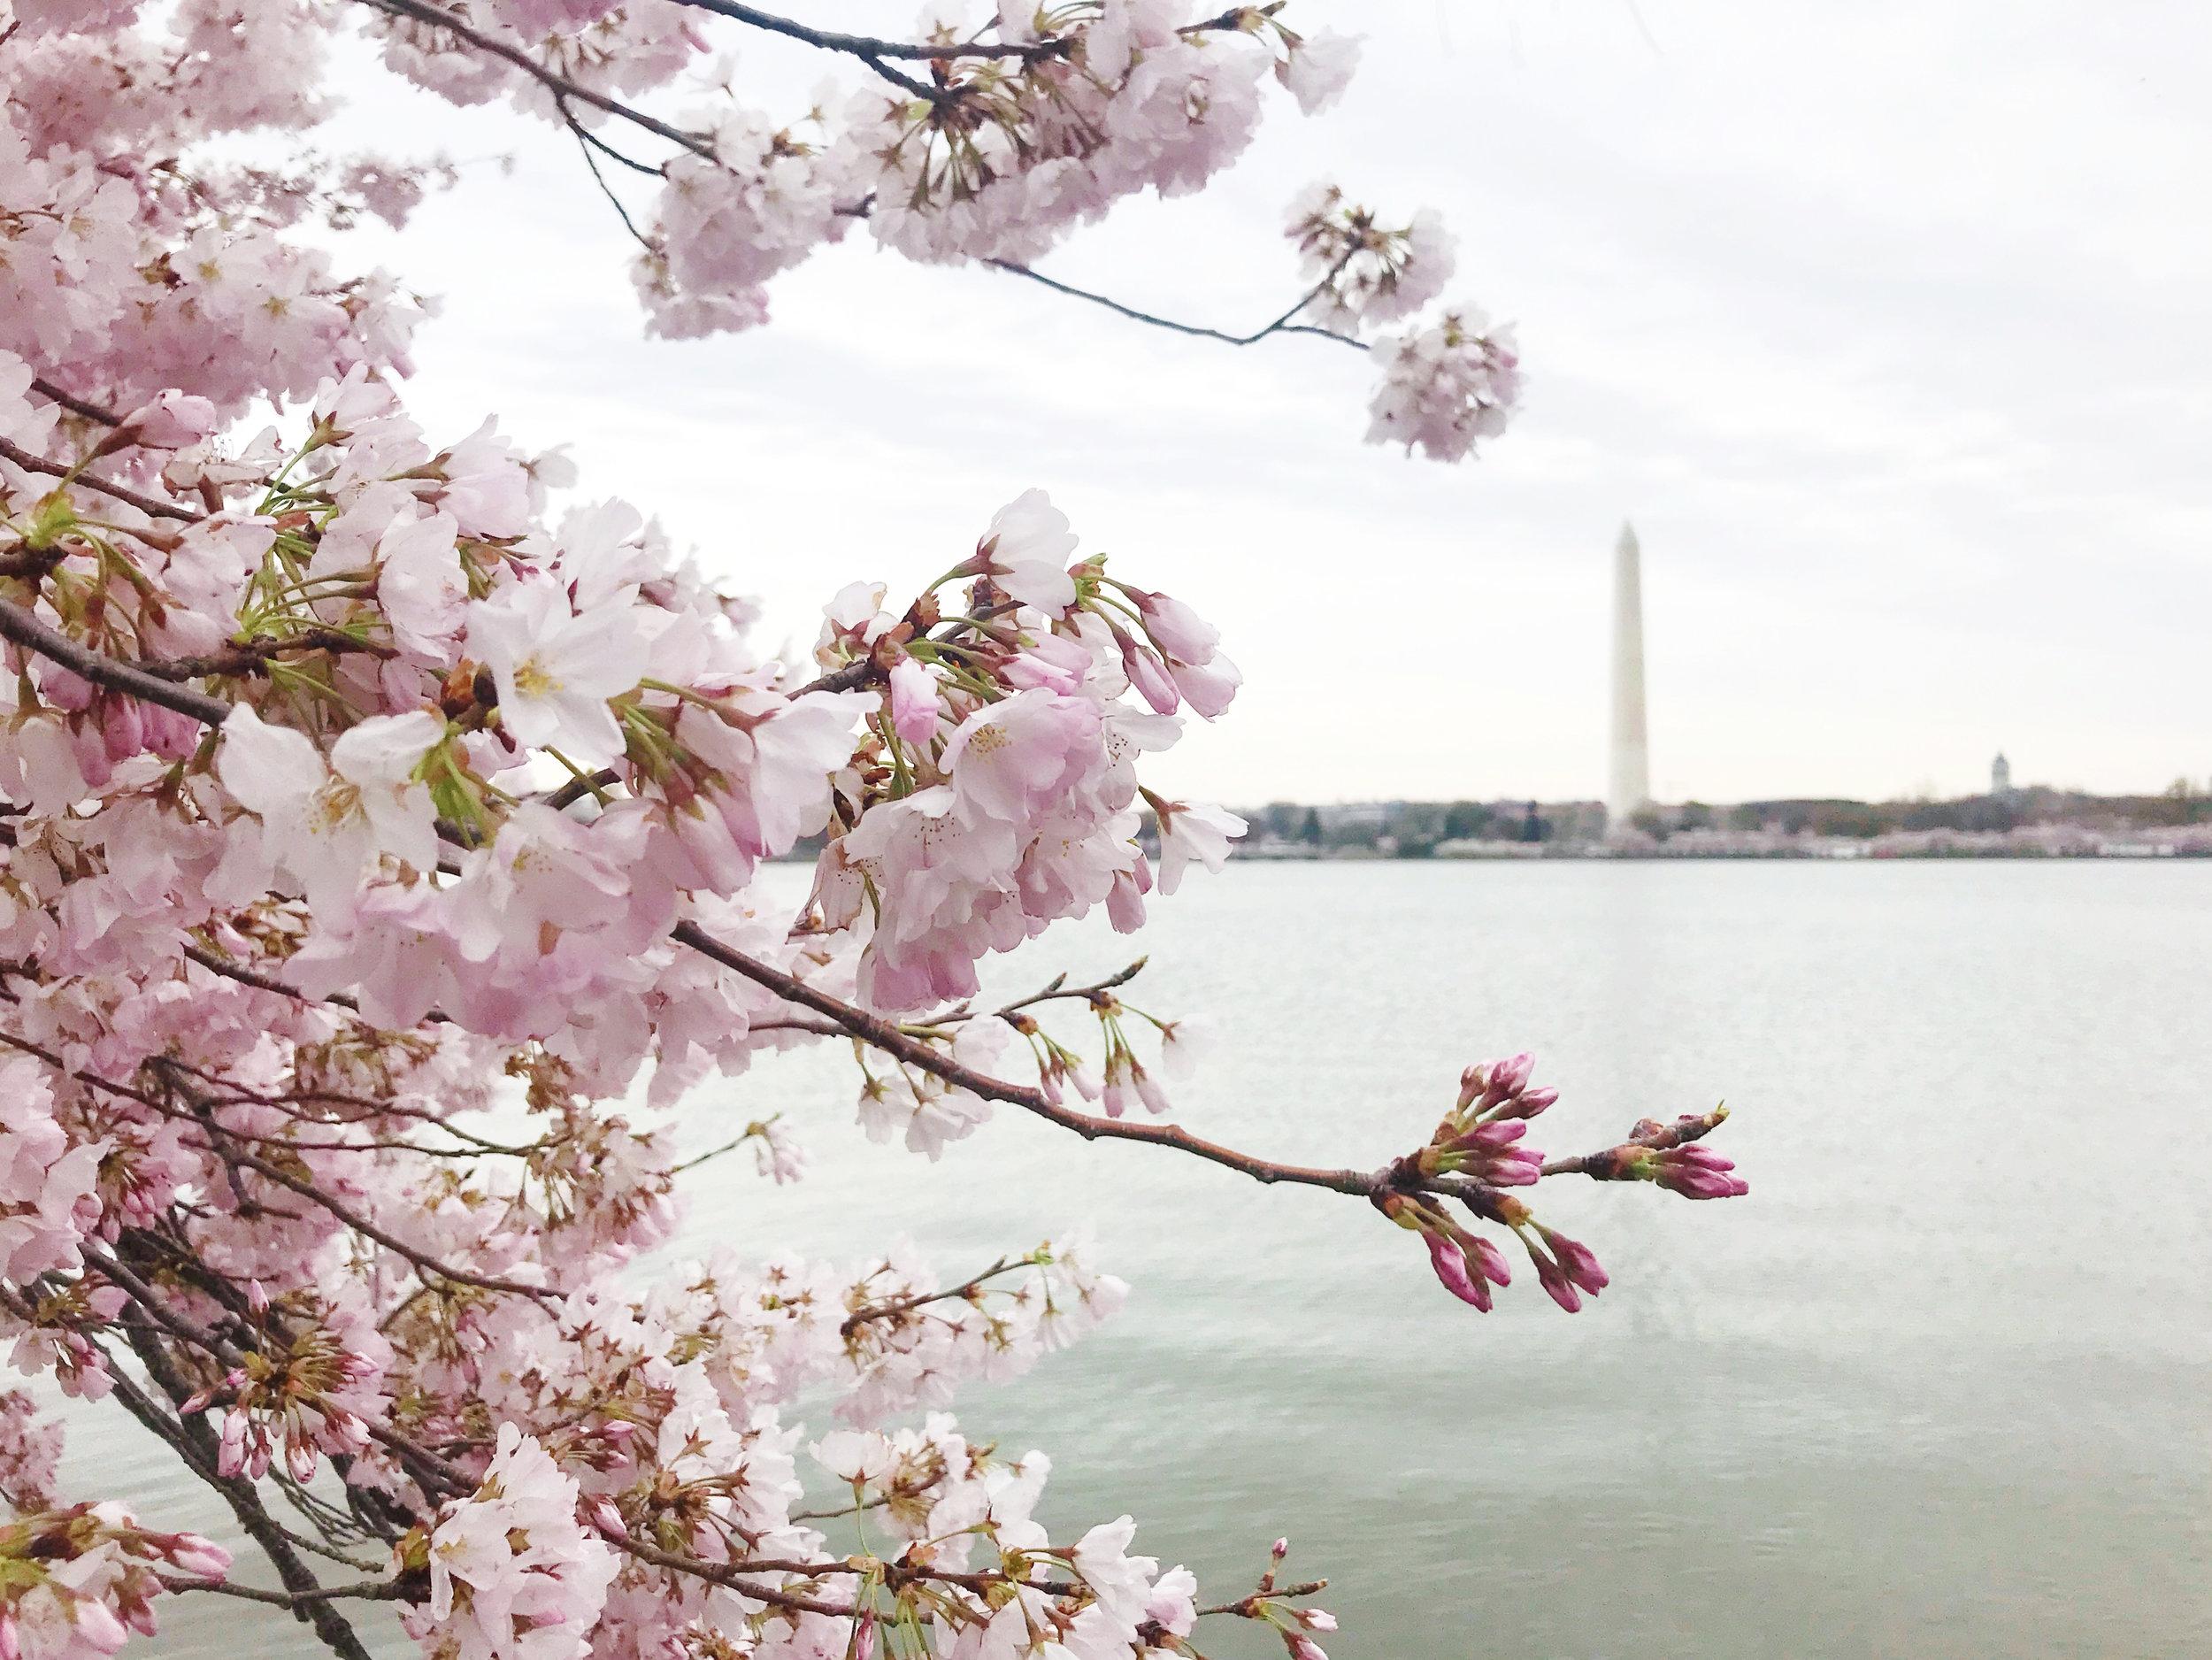 dc-cherry-blossoms-nora-knox-1.jpg